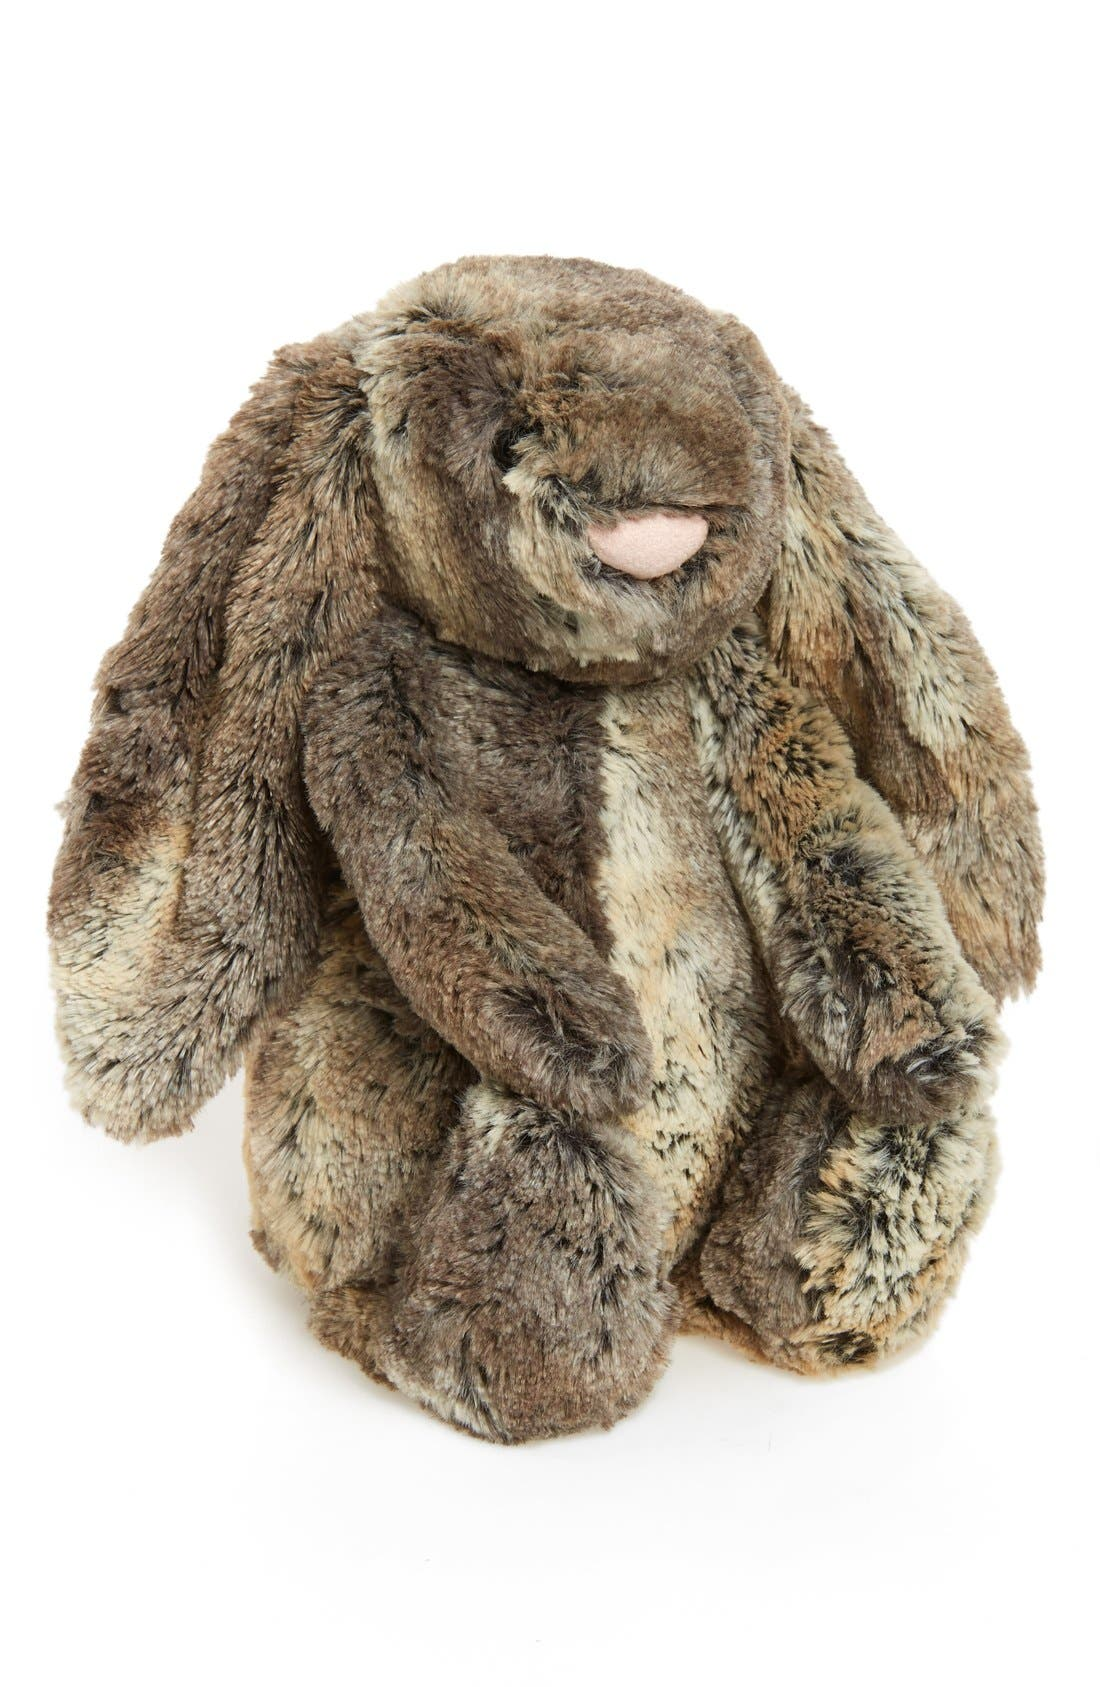 Jellycat Woodland Babe Bunny Stuffed Animal